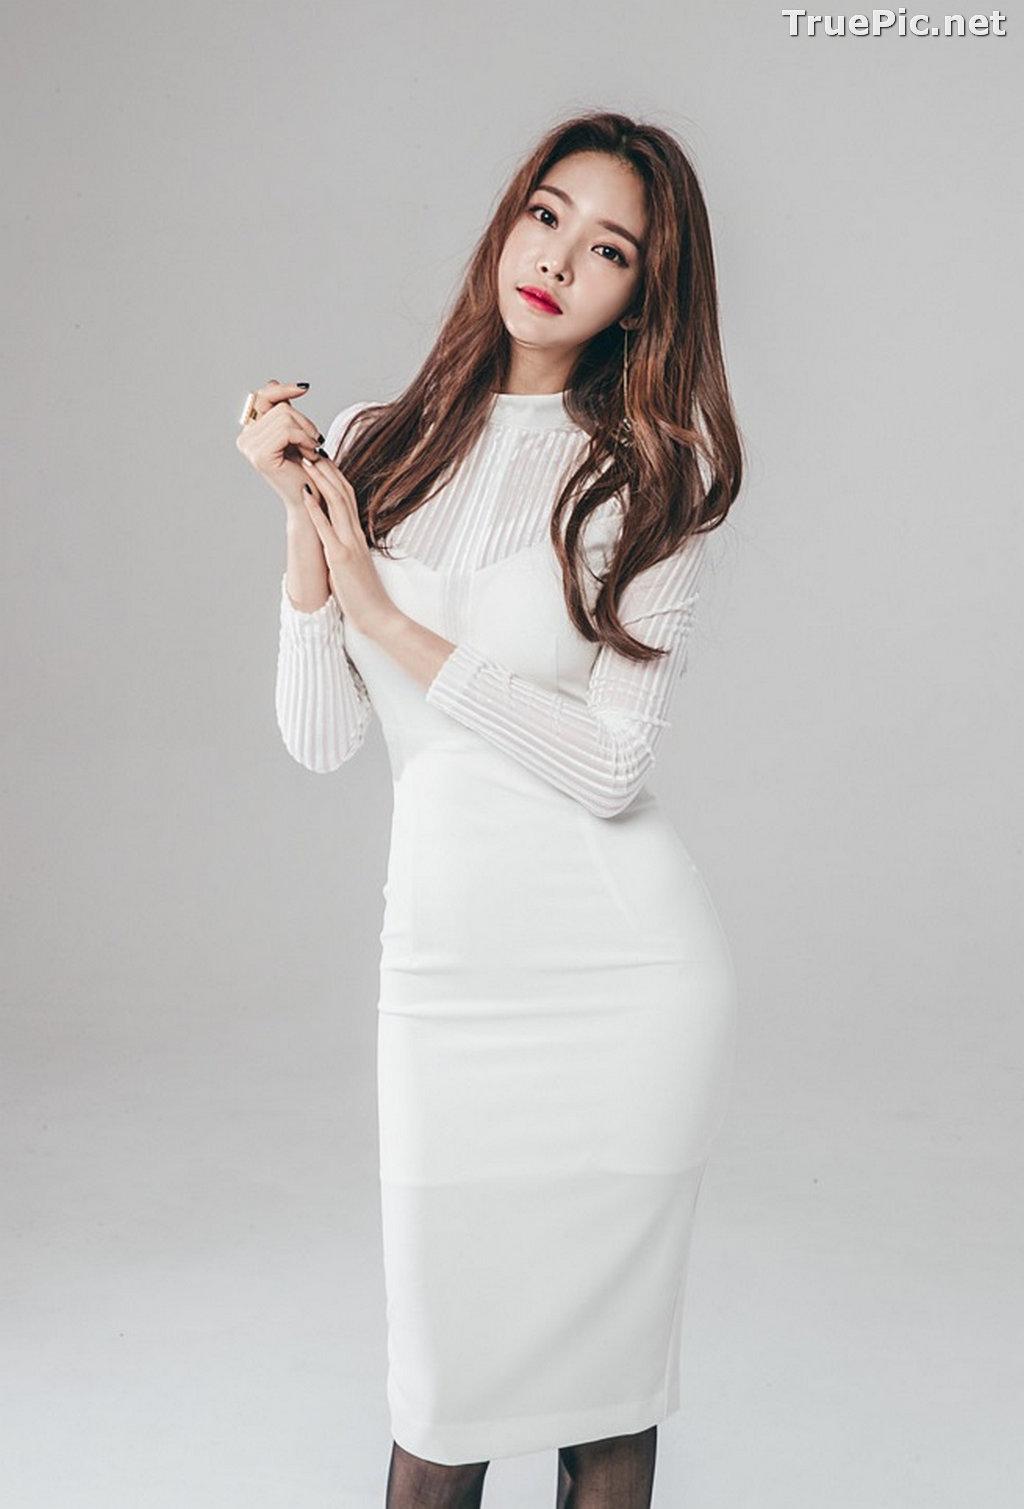 Image Korean Beautiful Model – Park Jung Yoon – Fashion Photography #11 - TruePic.net - Picture-49